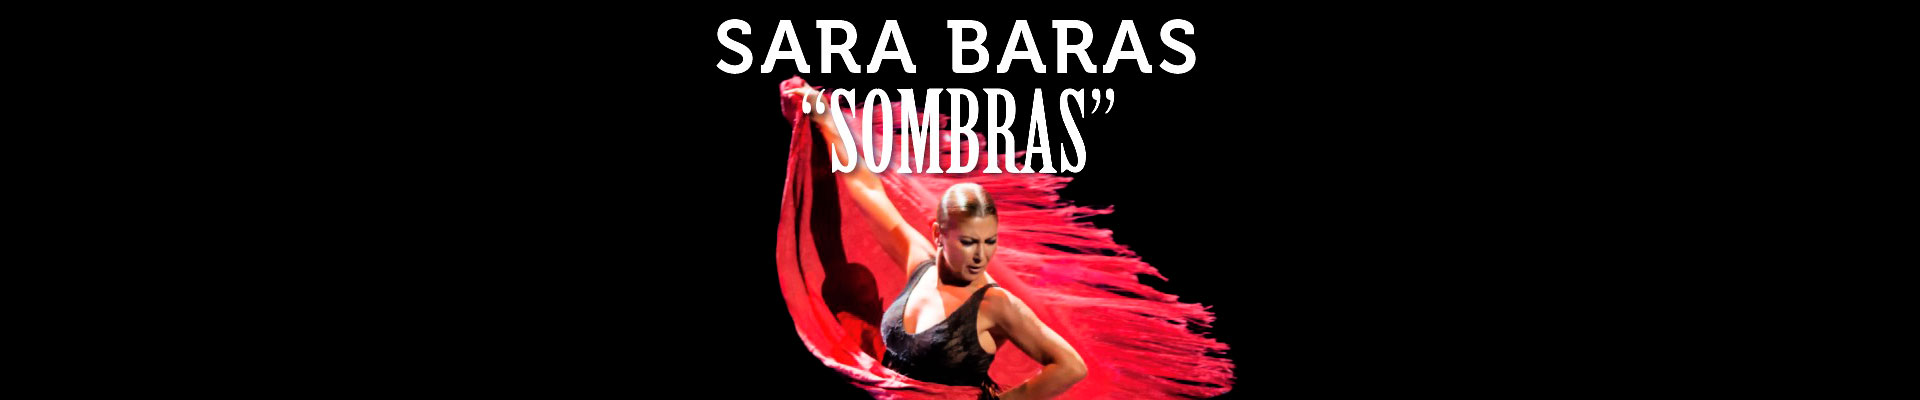 FLAMENCO SOMBRAS TIVOLI Sara Baras BARCELONA